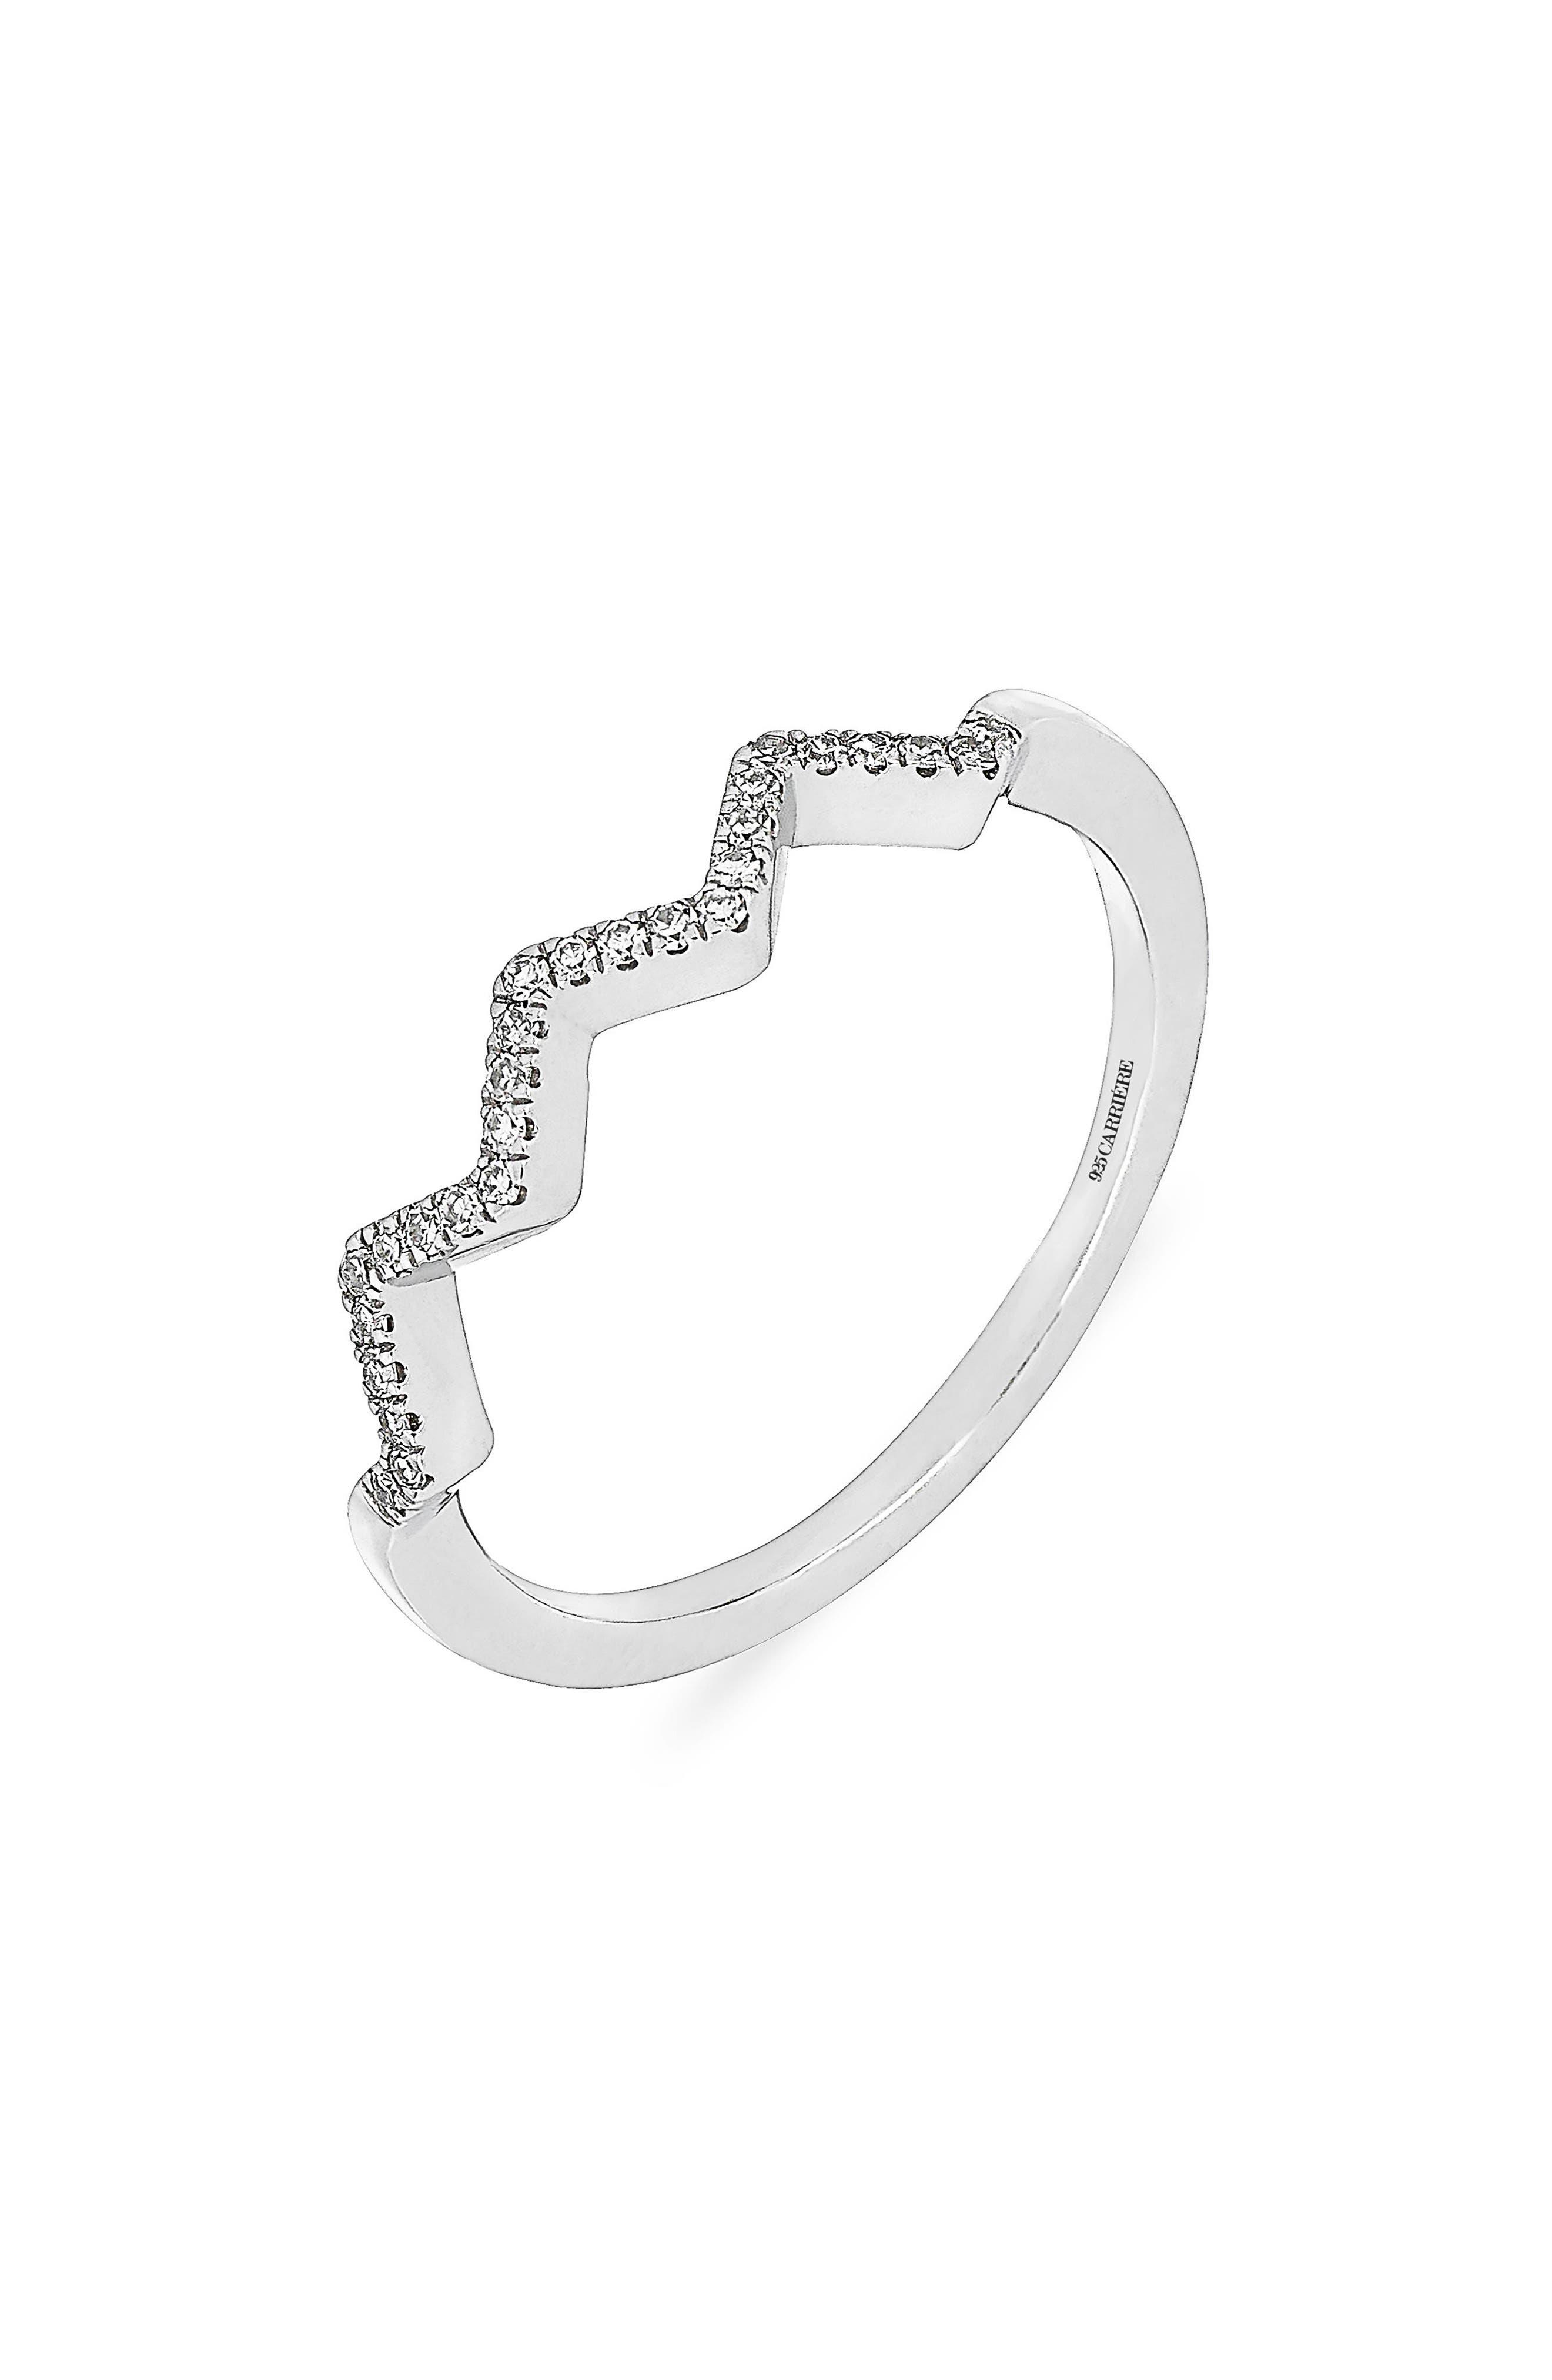 Carrière Zigzag Diamond Ring,                         Main,                         color, Silver/ Diamond